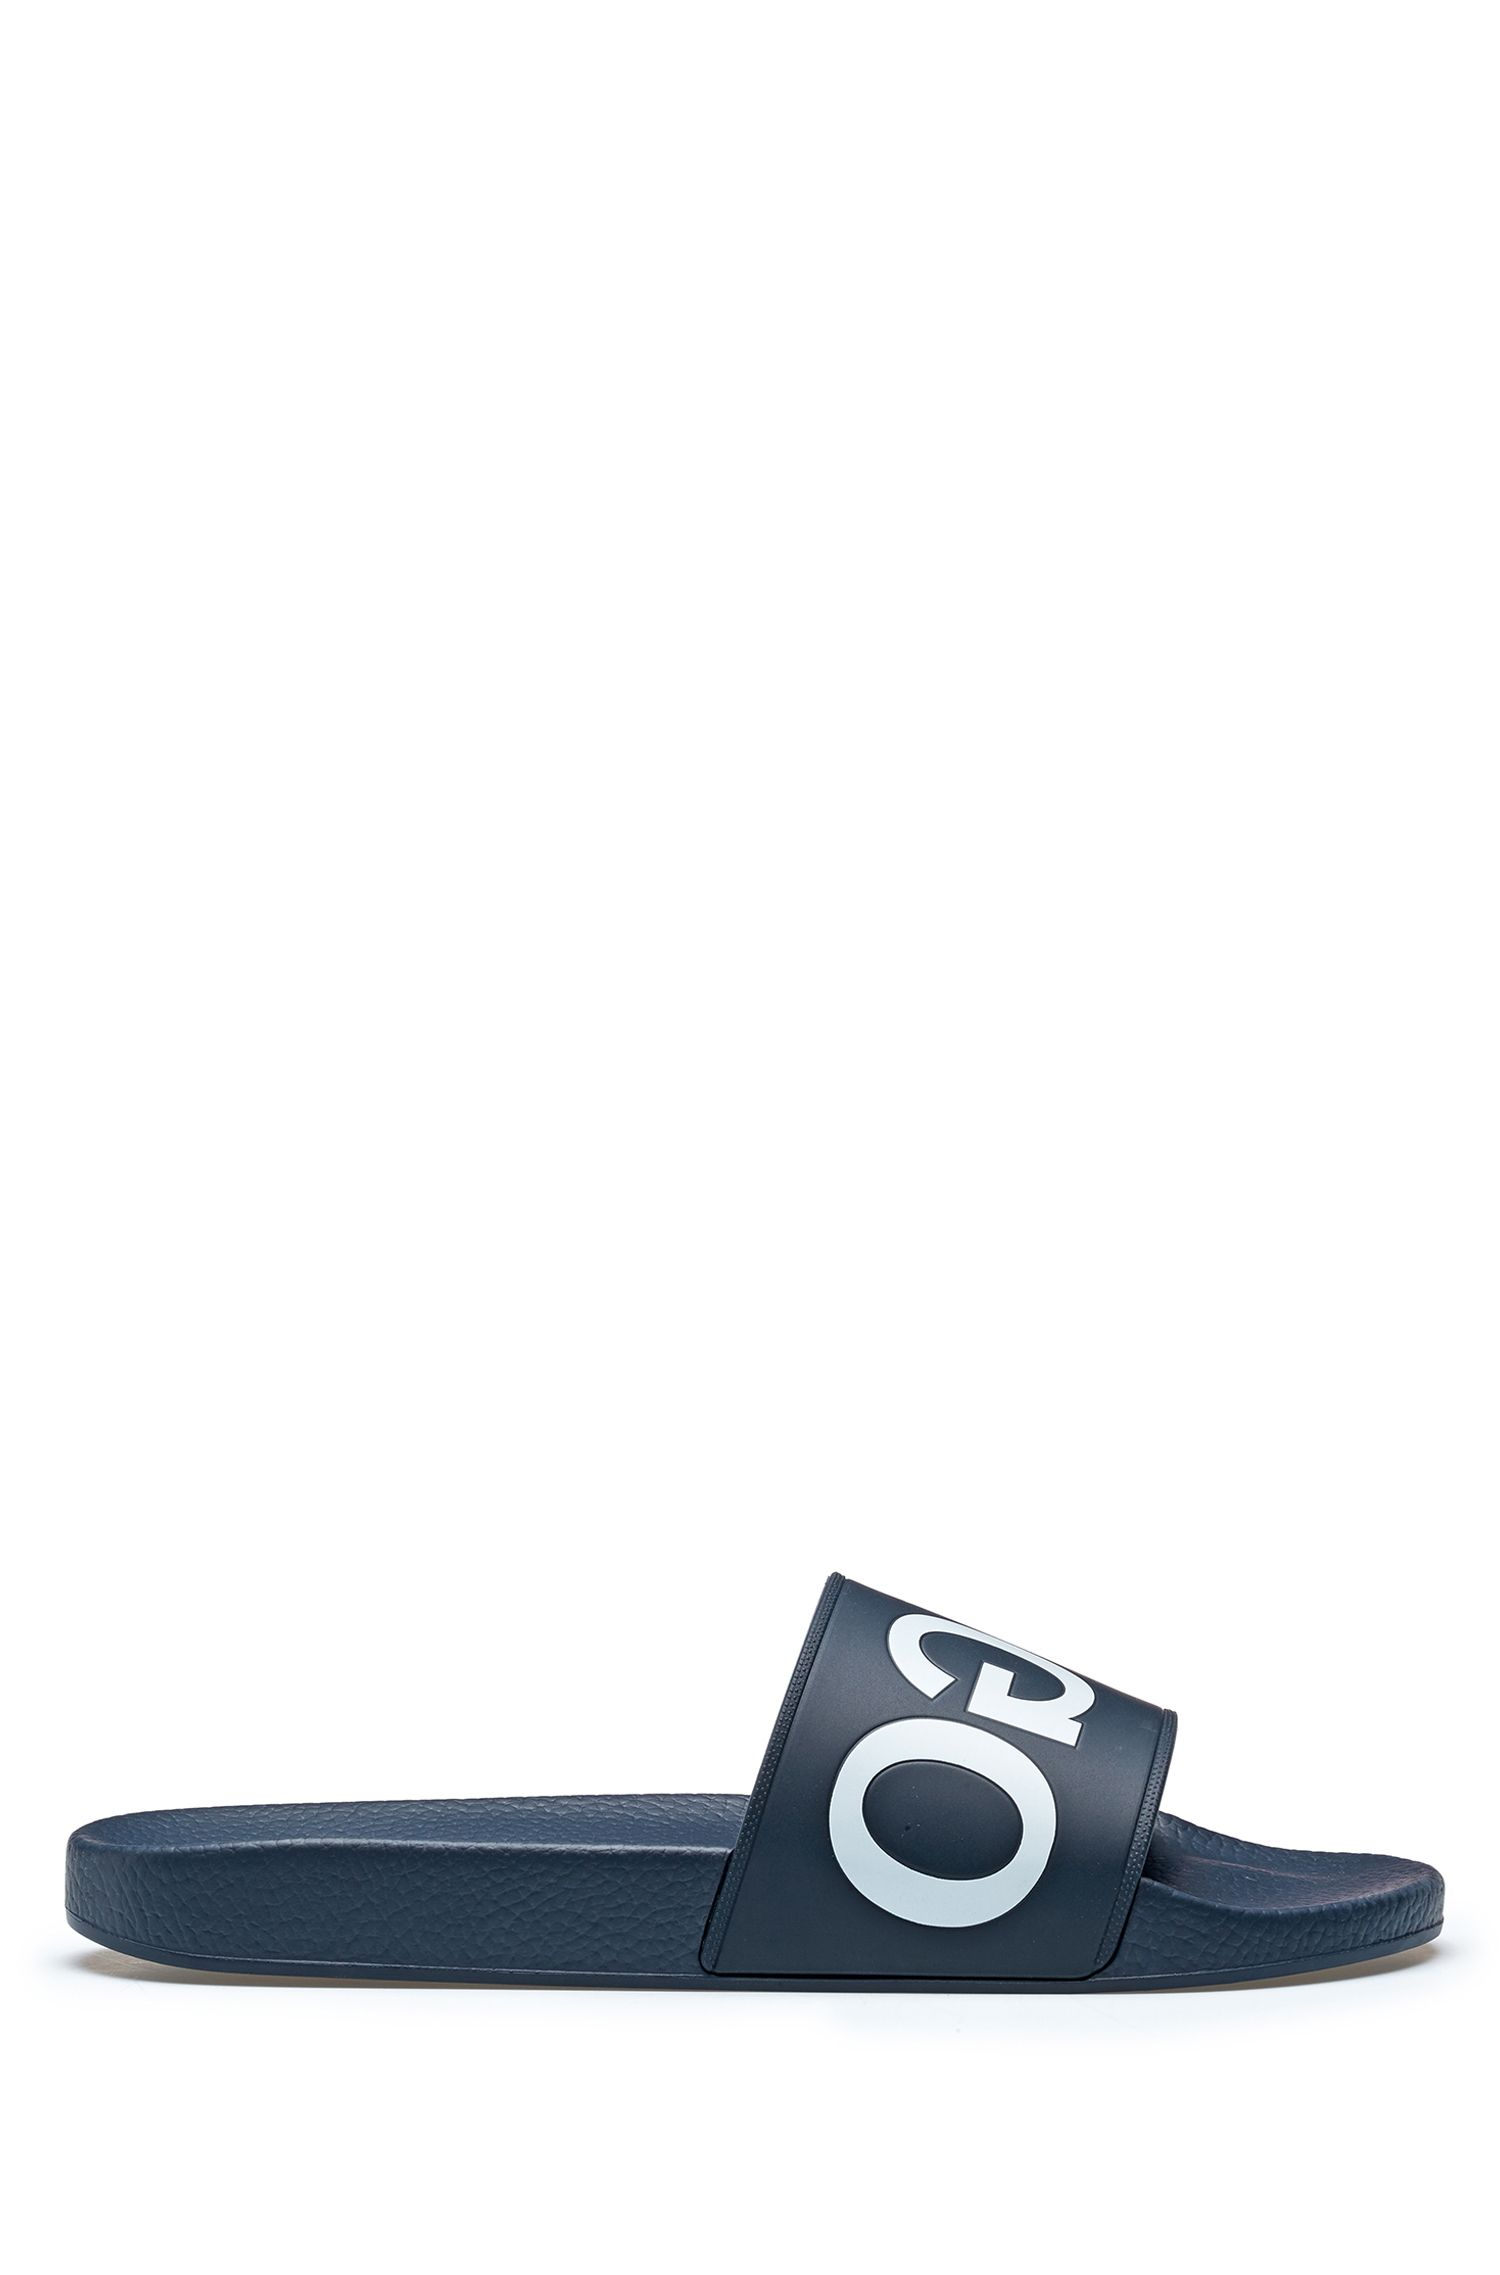 Reverse-logo pool slider sandals, Dark Blue